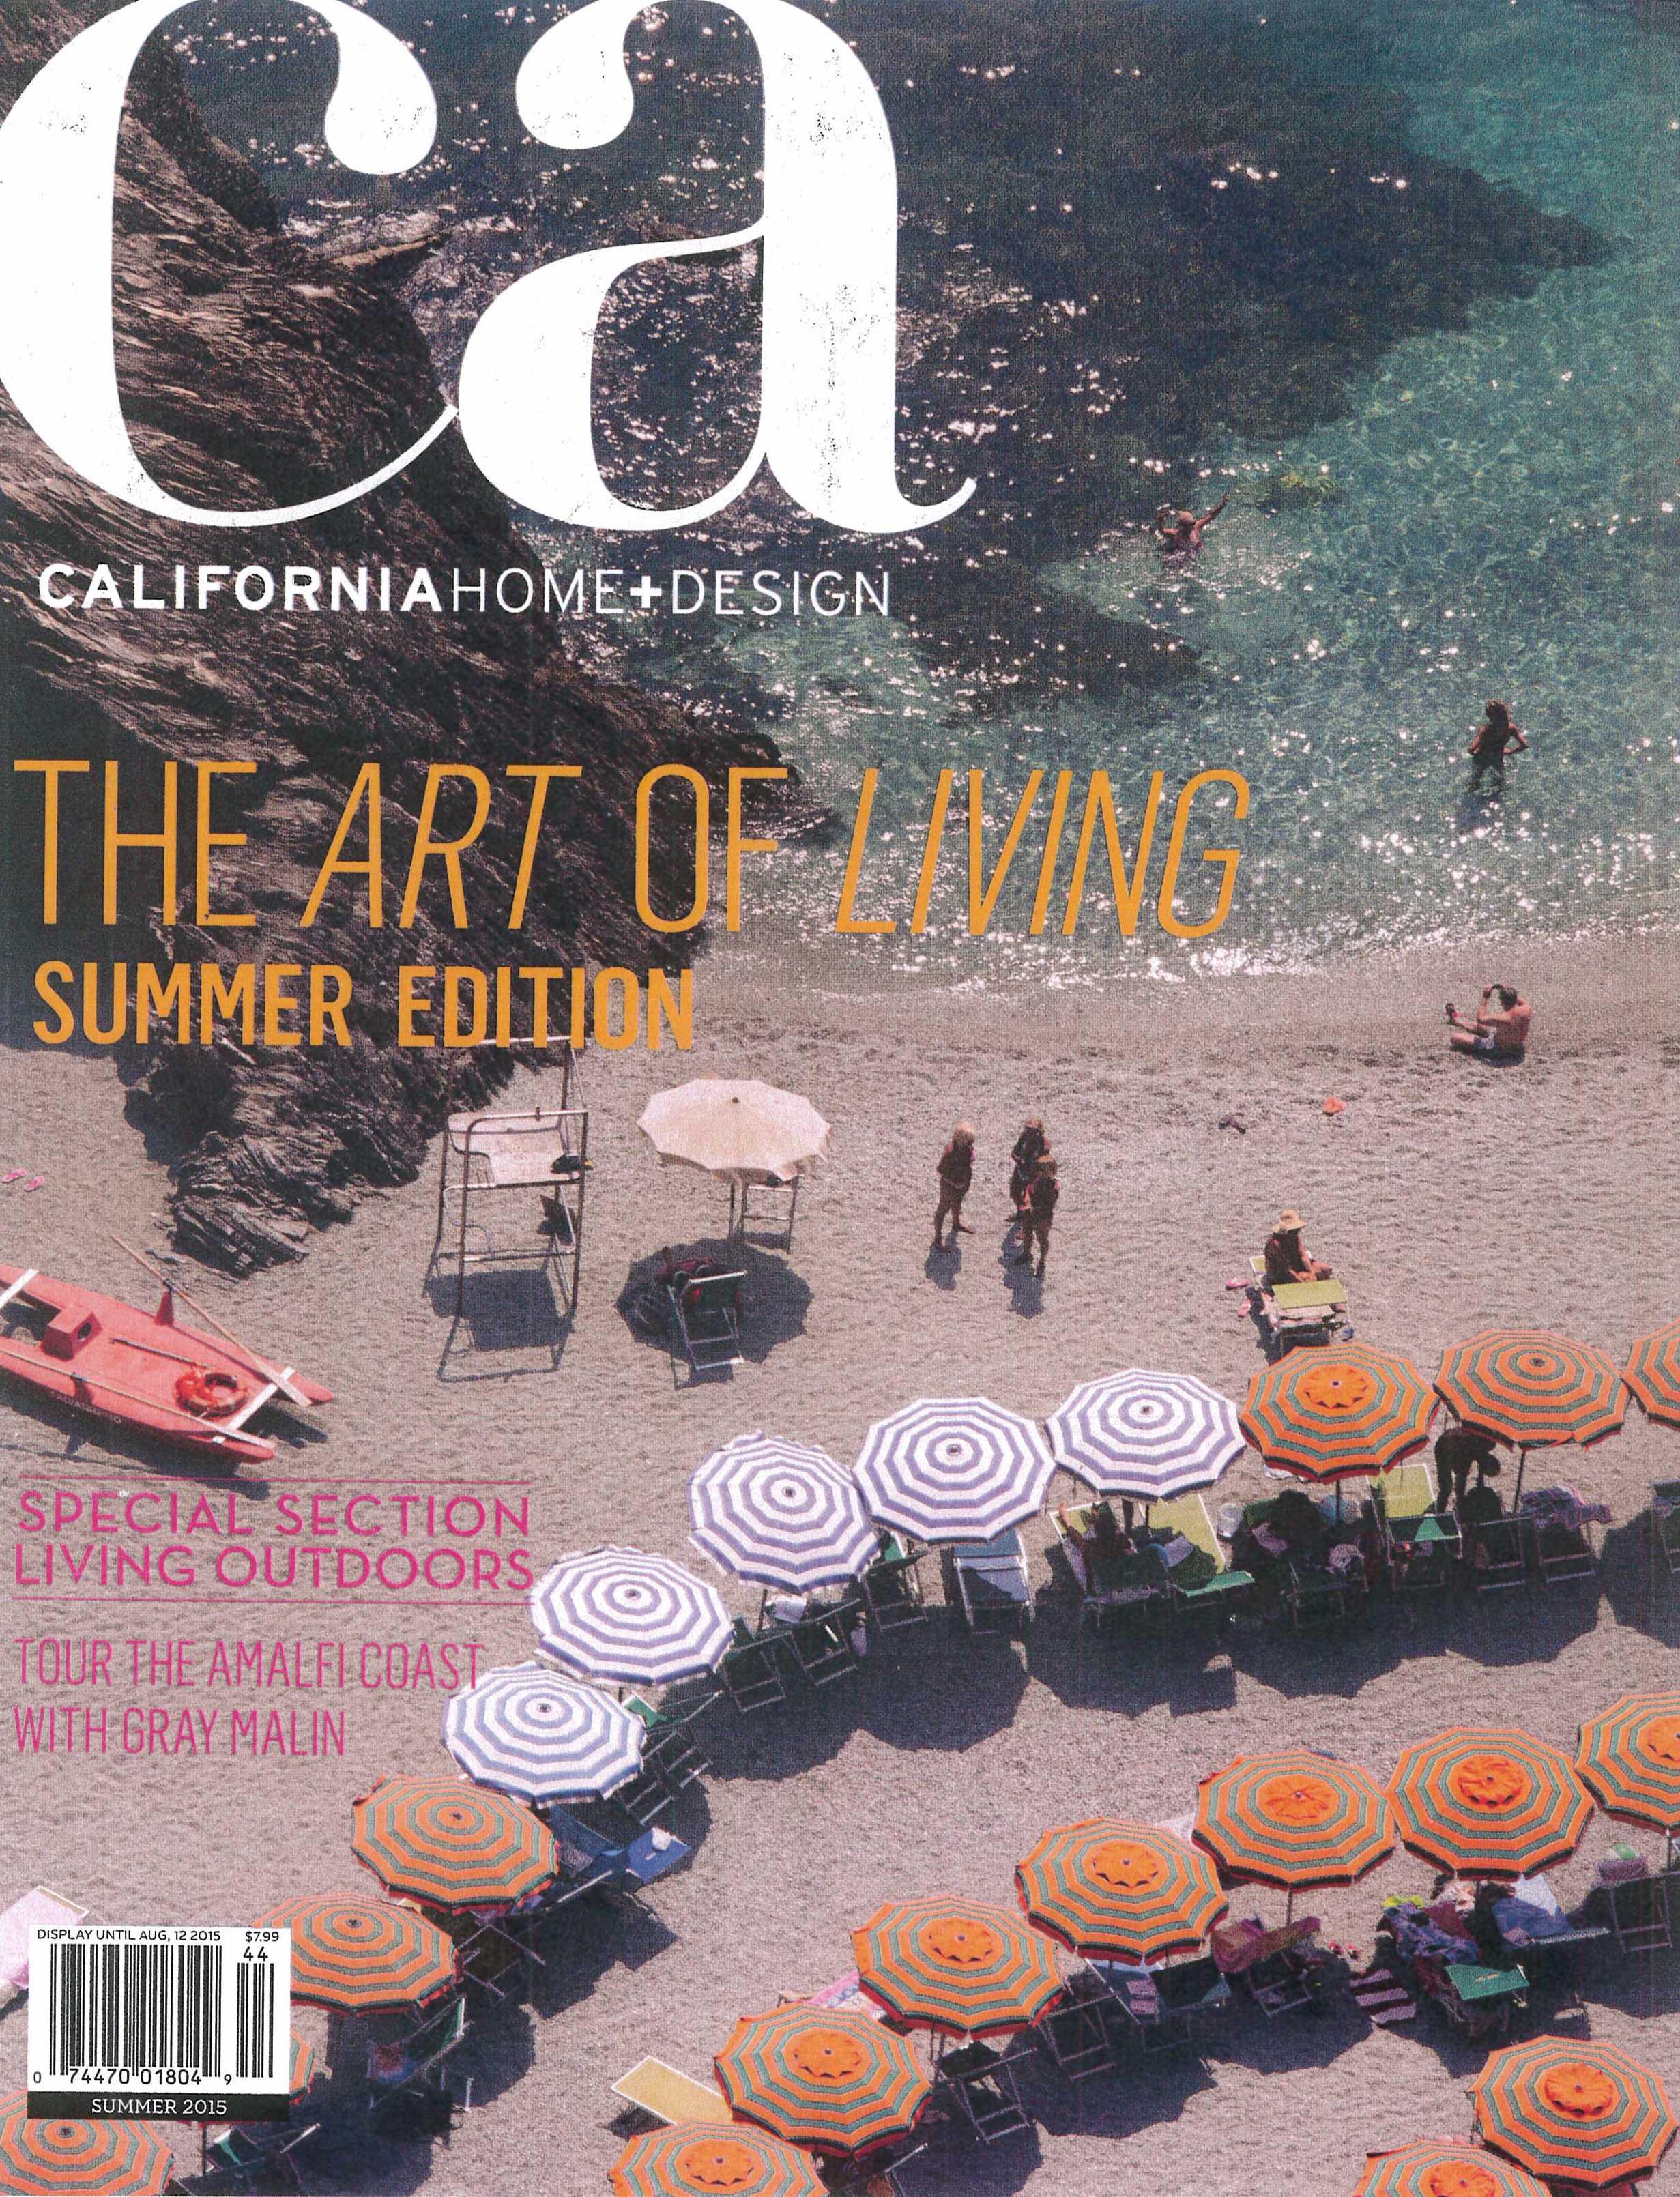 c8fdb-ca-home-design-2015-summer_cover.jpg